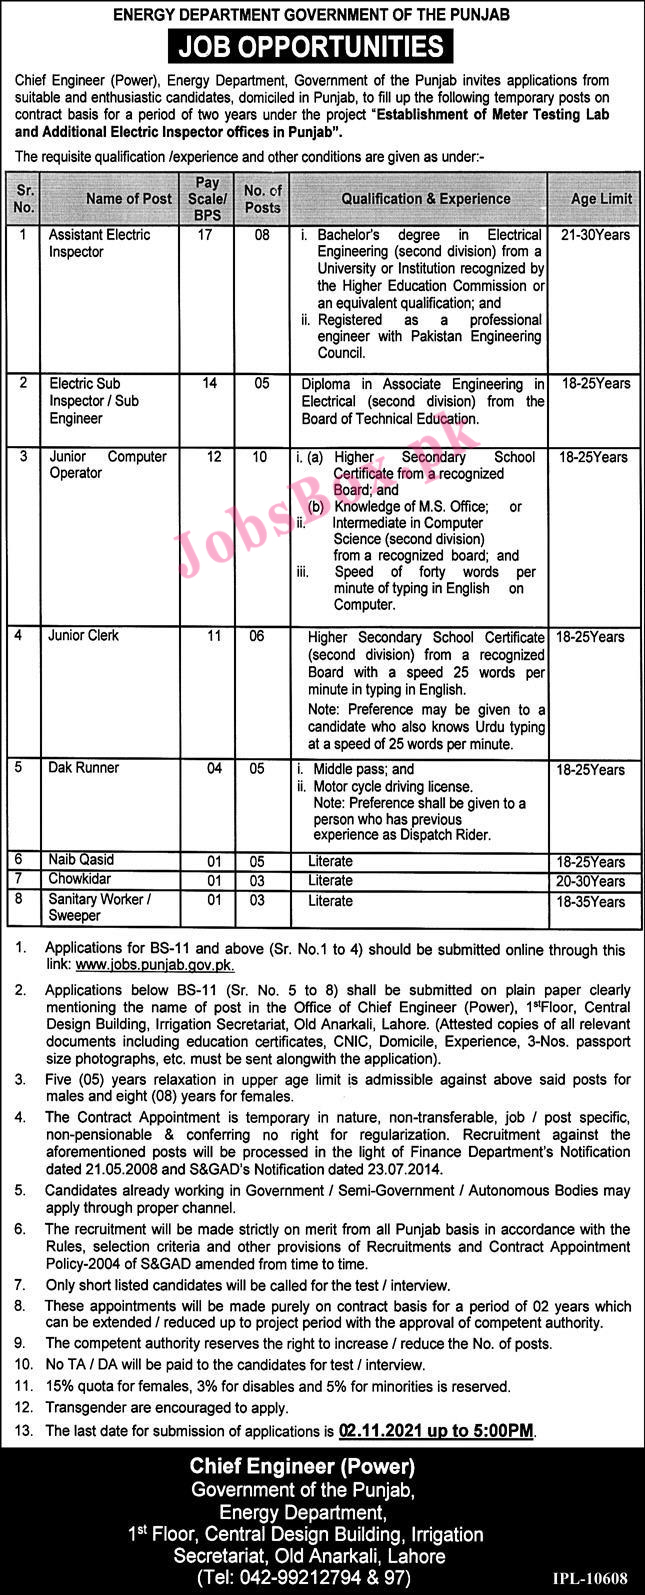 Energy Department Punjab Jobs 2021 - www.jobs.punjab.gov.pk